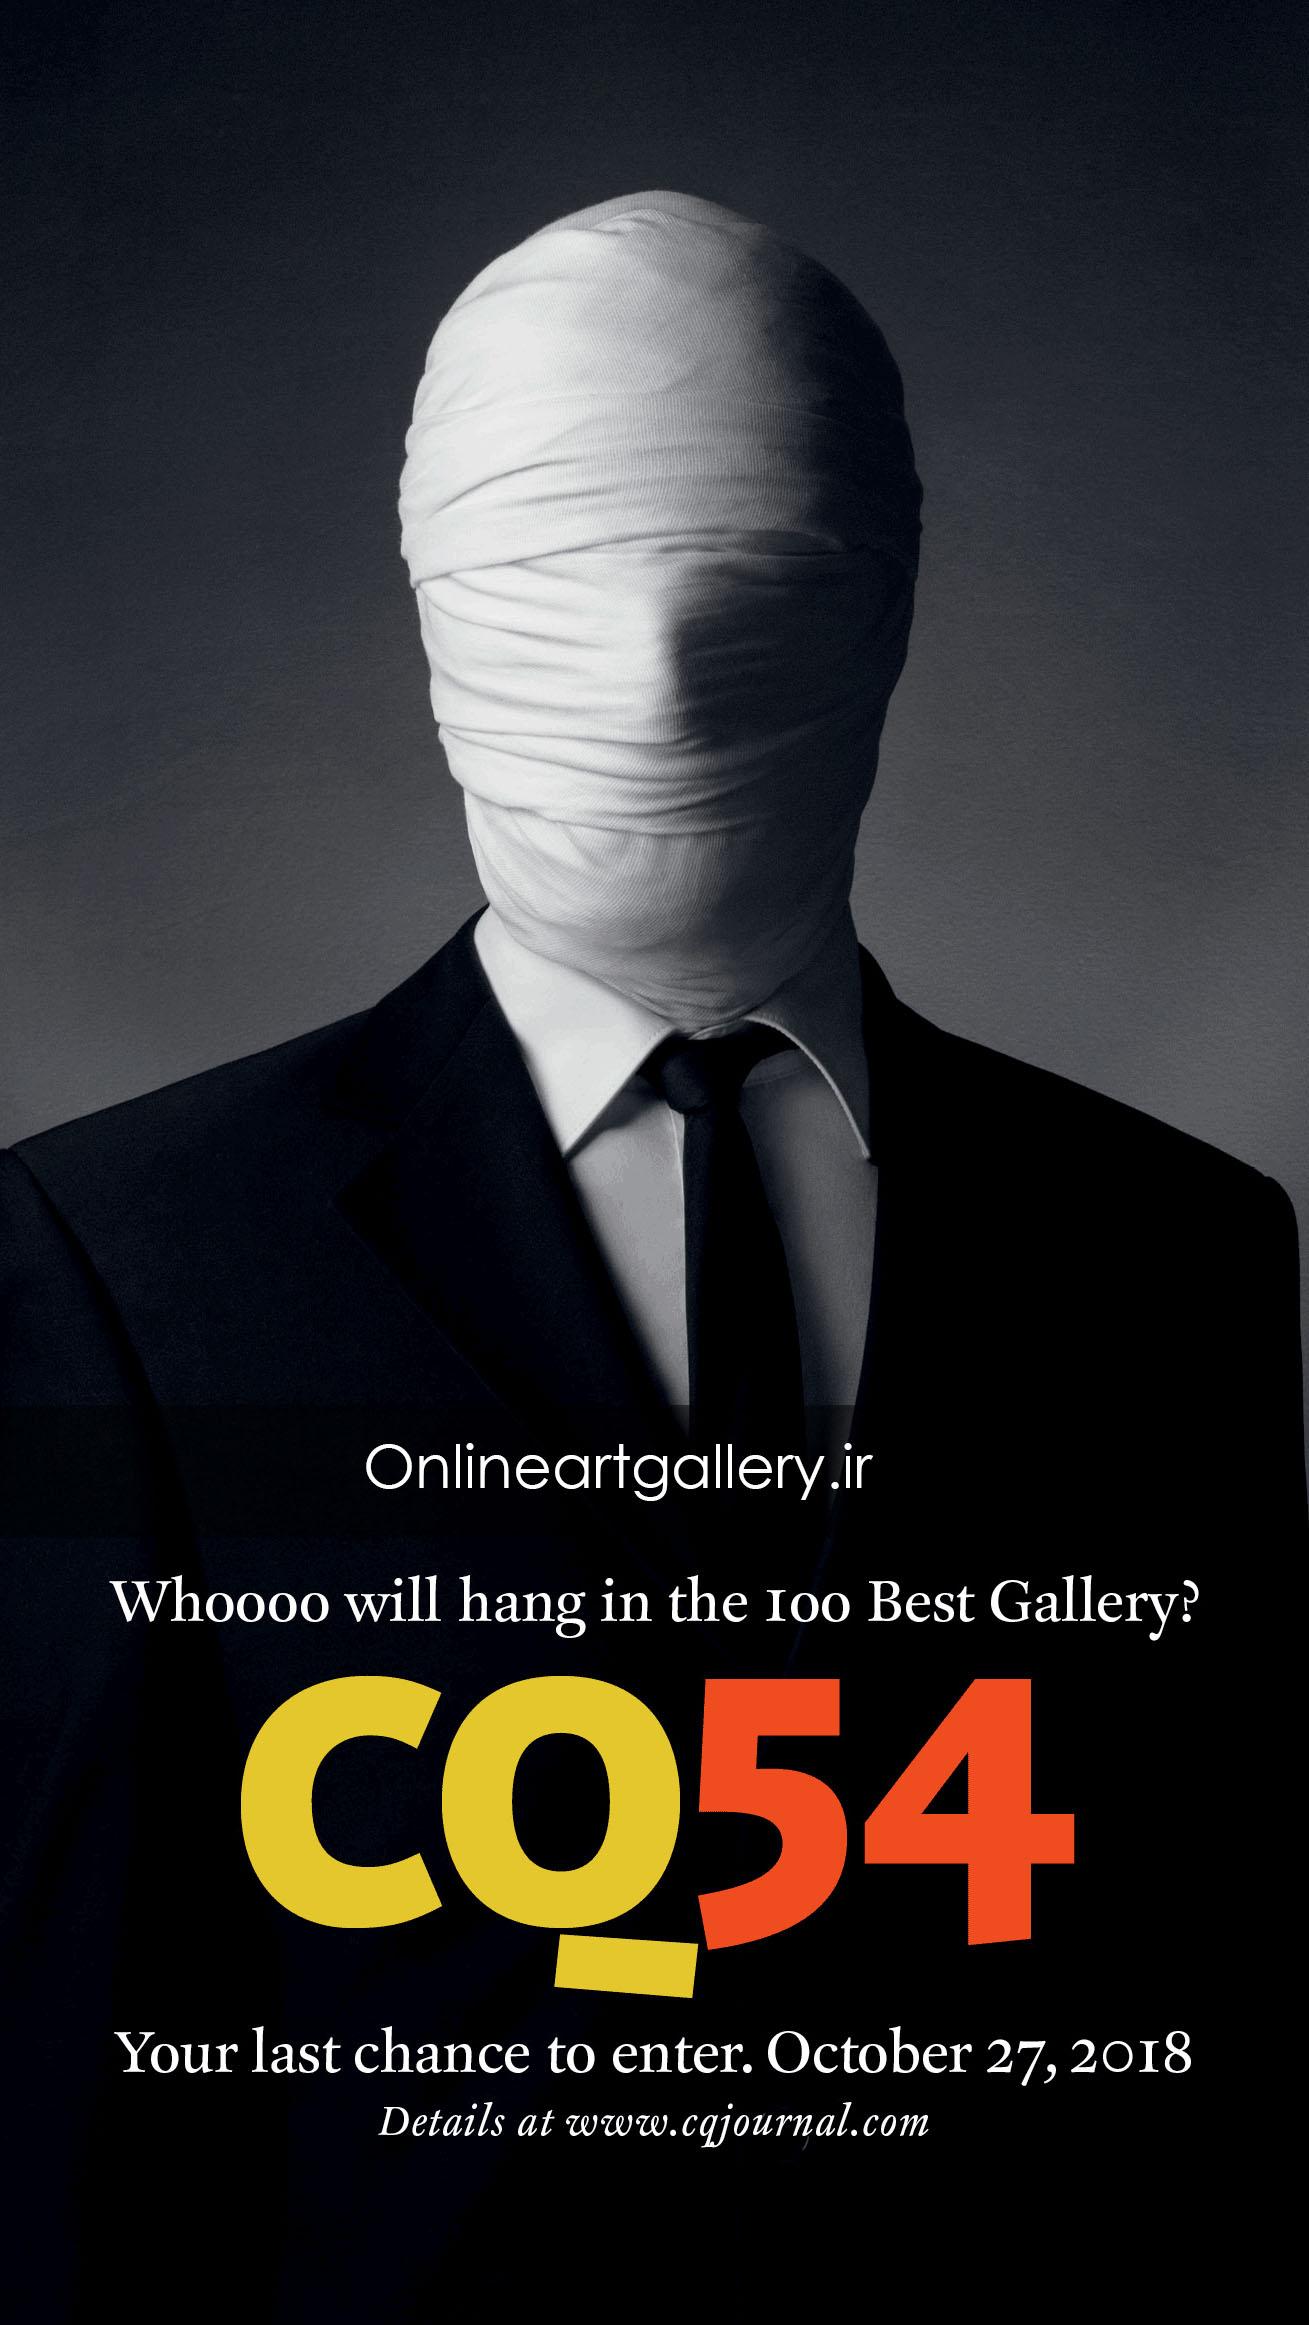 فراخوان فصلنامه خلاق (CQ) 54th International Competition Juried